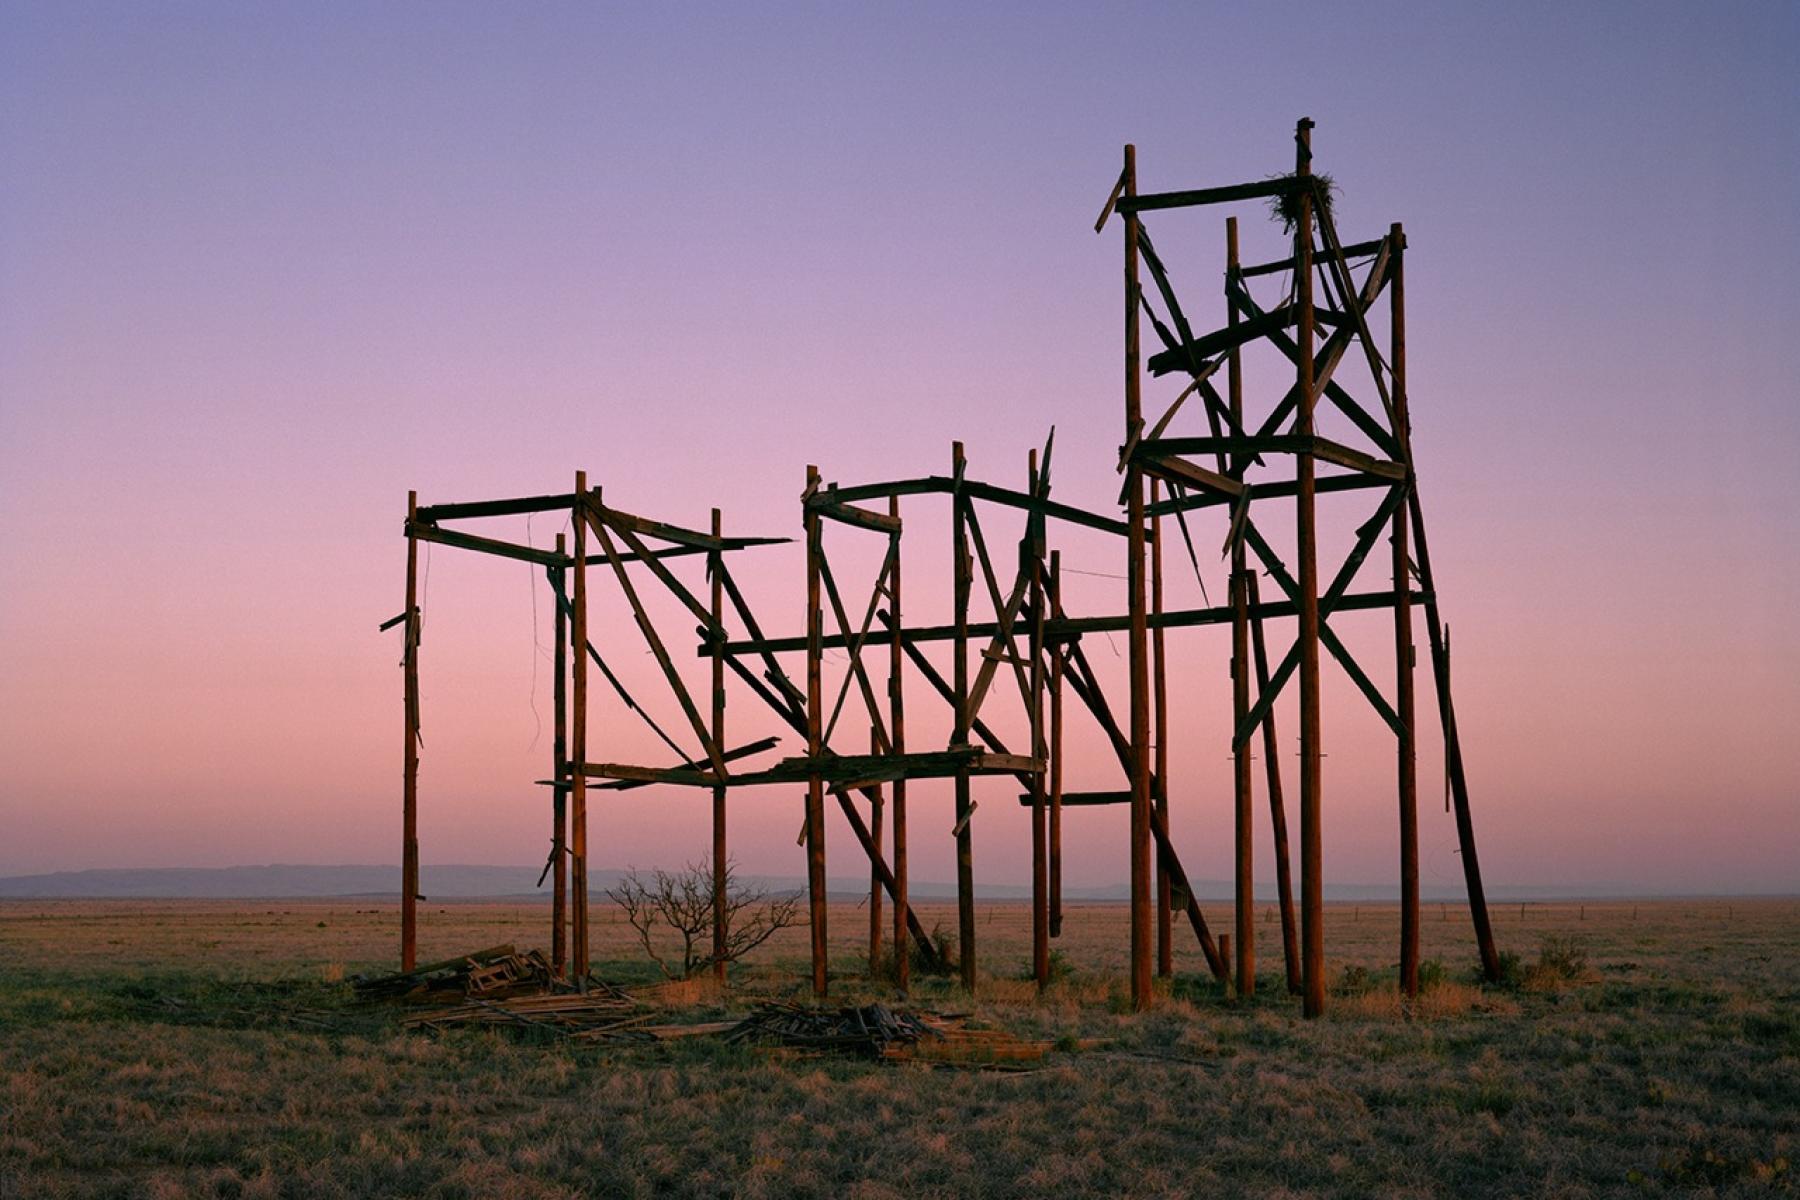 Sunrise Filmset Sunset, 2012 Teresa Hubbard / Alexander Birchler Diptych, each image 43.5 x 54.5 inches Edition of 6 + 2AP